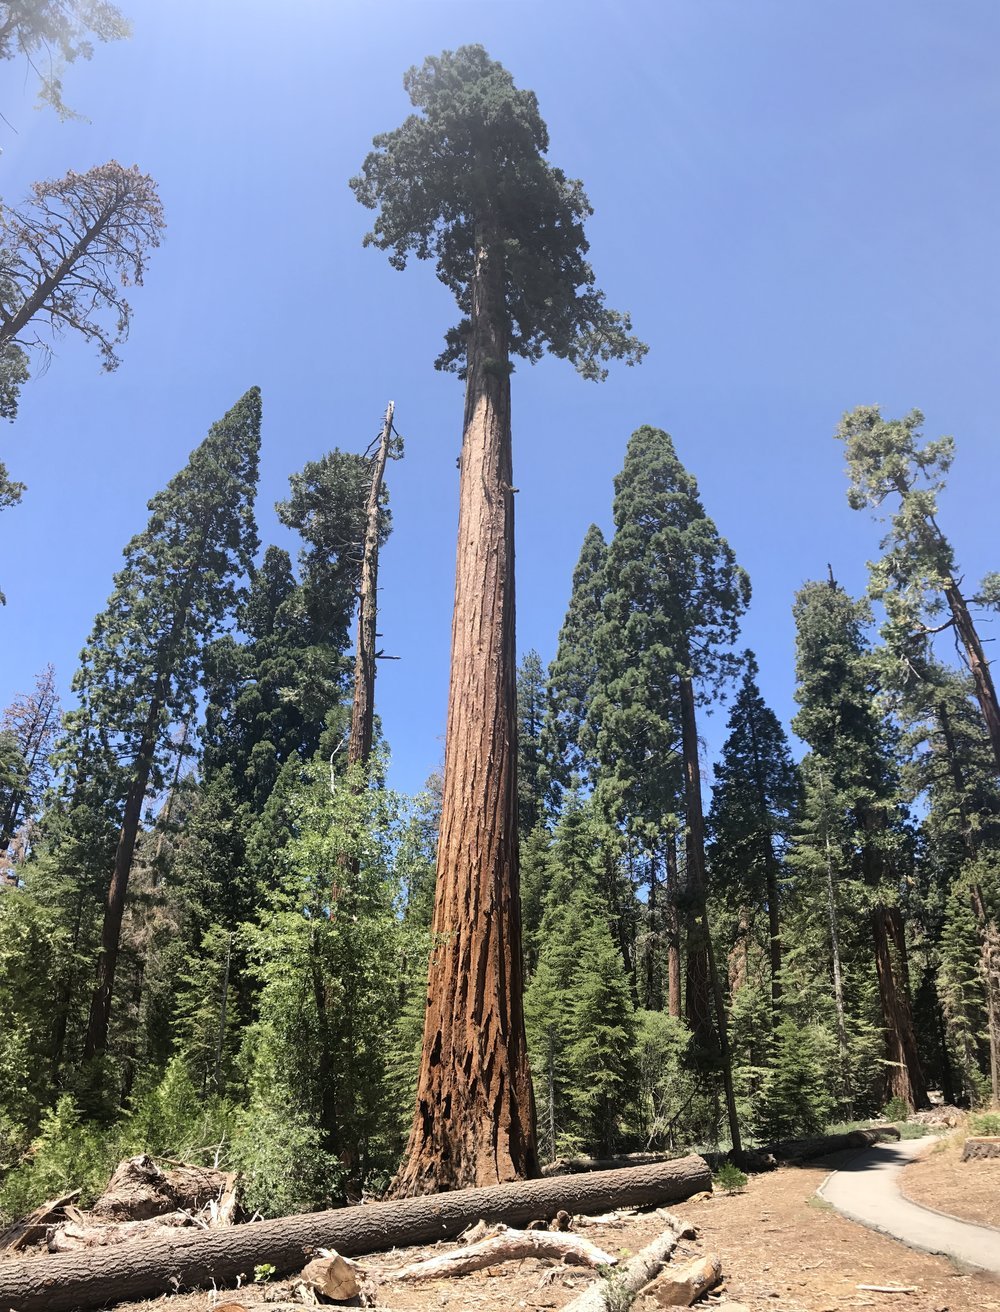 Giant Sequoia, Sequoia National Forest, California